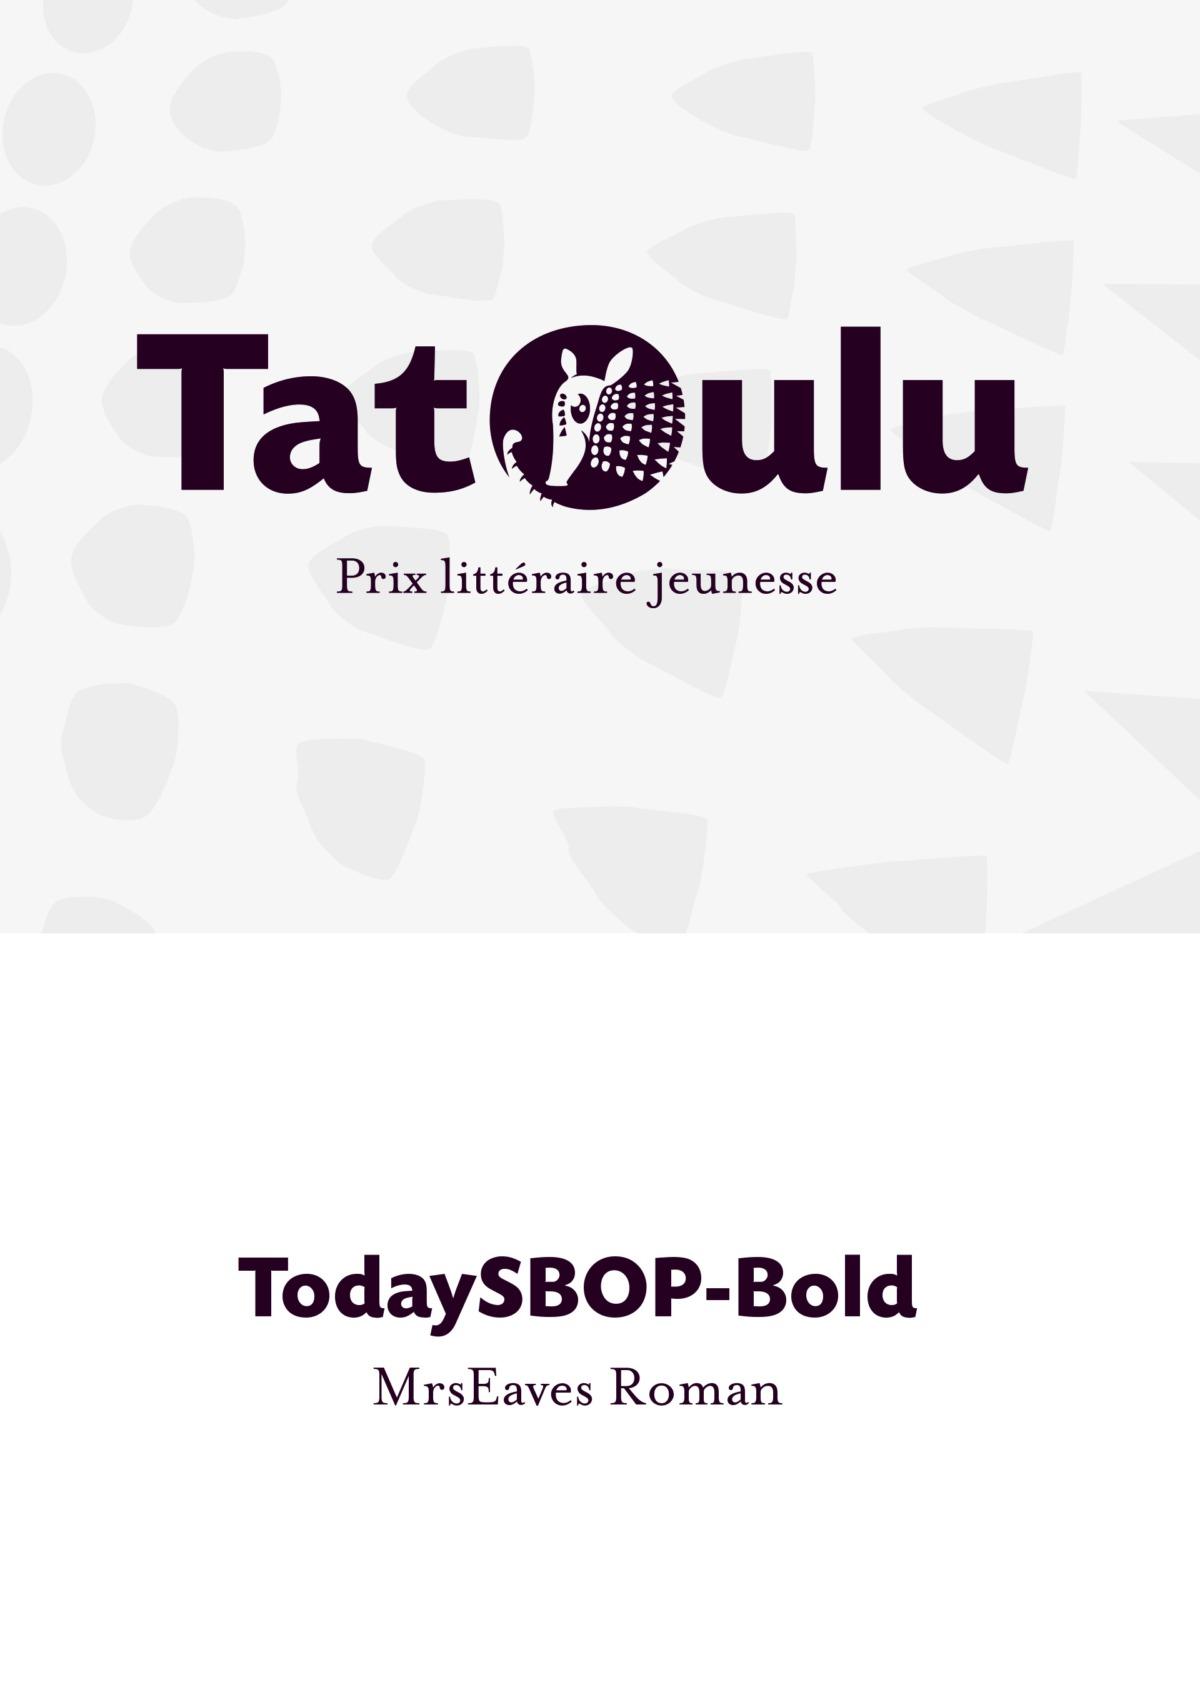 Création du logo du prix Tatoulu - janzé- Bretagne